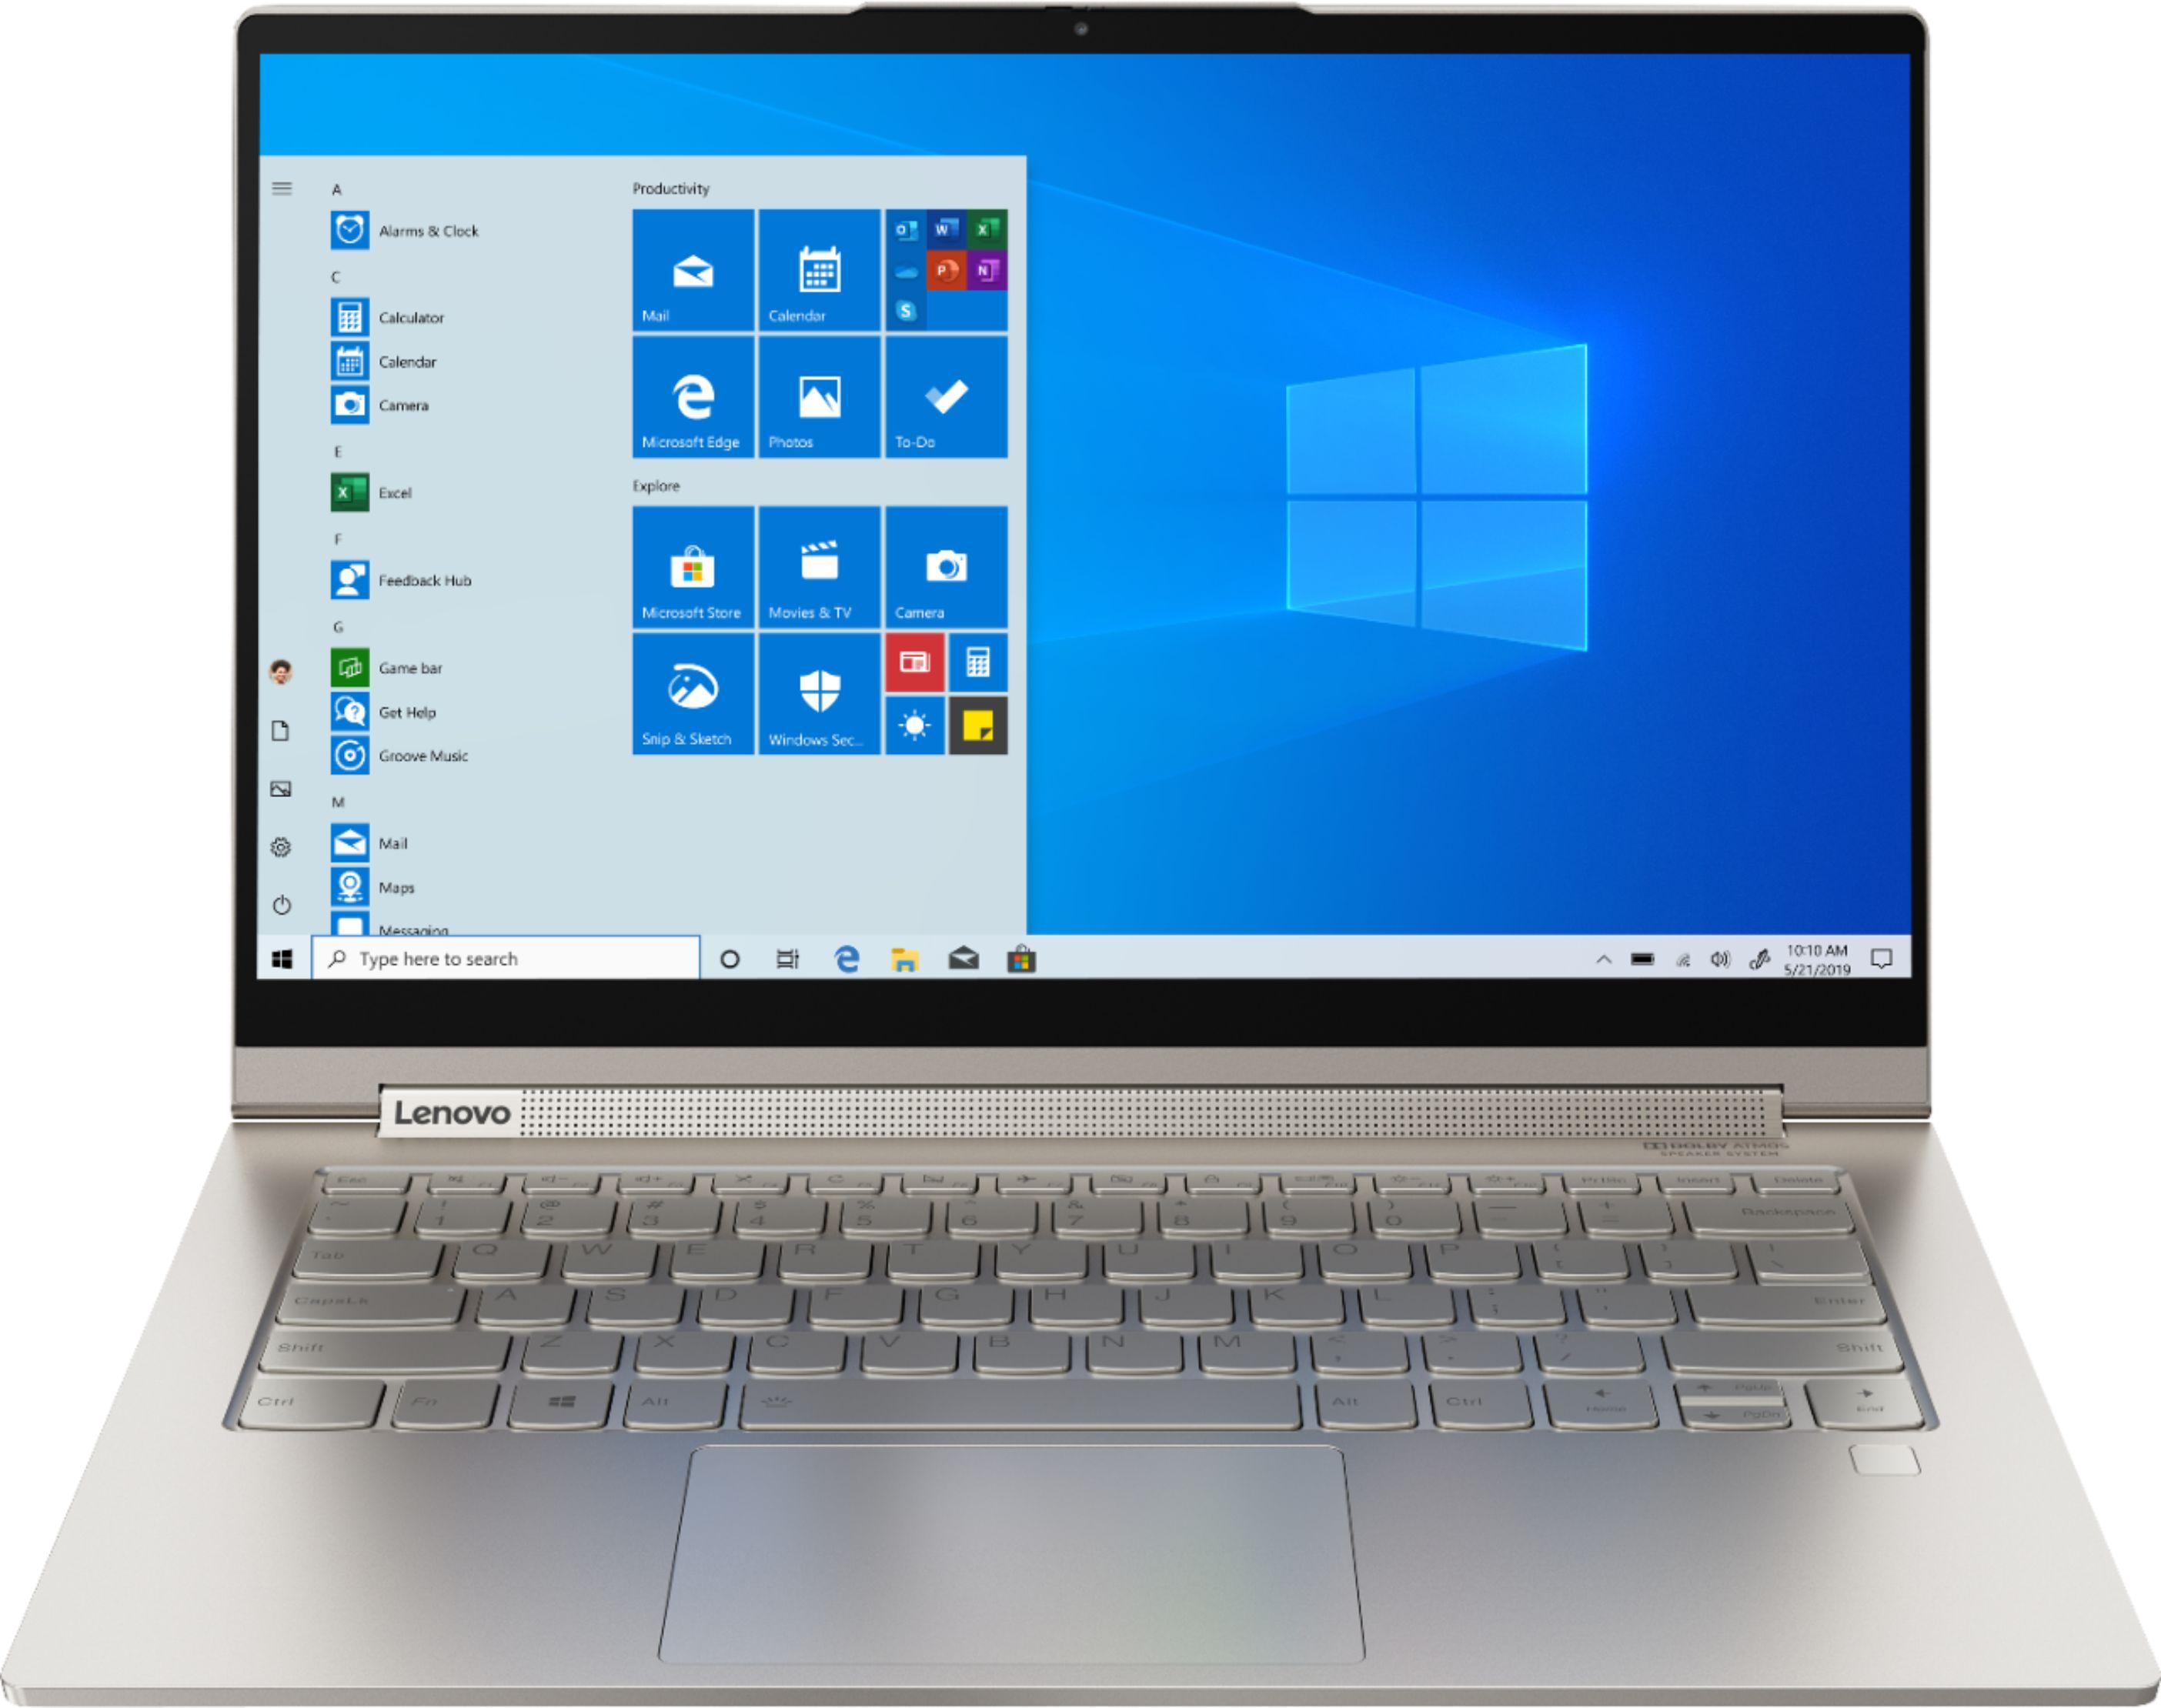 "Lenovo Yoga C940 2-in-1 Laptop: Intel Core i7-1065G7, 14"" 4K IPS Touchscreen, 16GB DDR4, 512GB SSD, Win 10 $1199.99 + Free Shipping @ Best Buy"